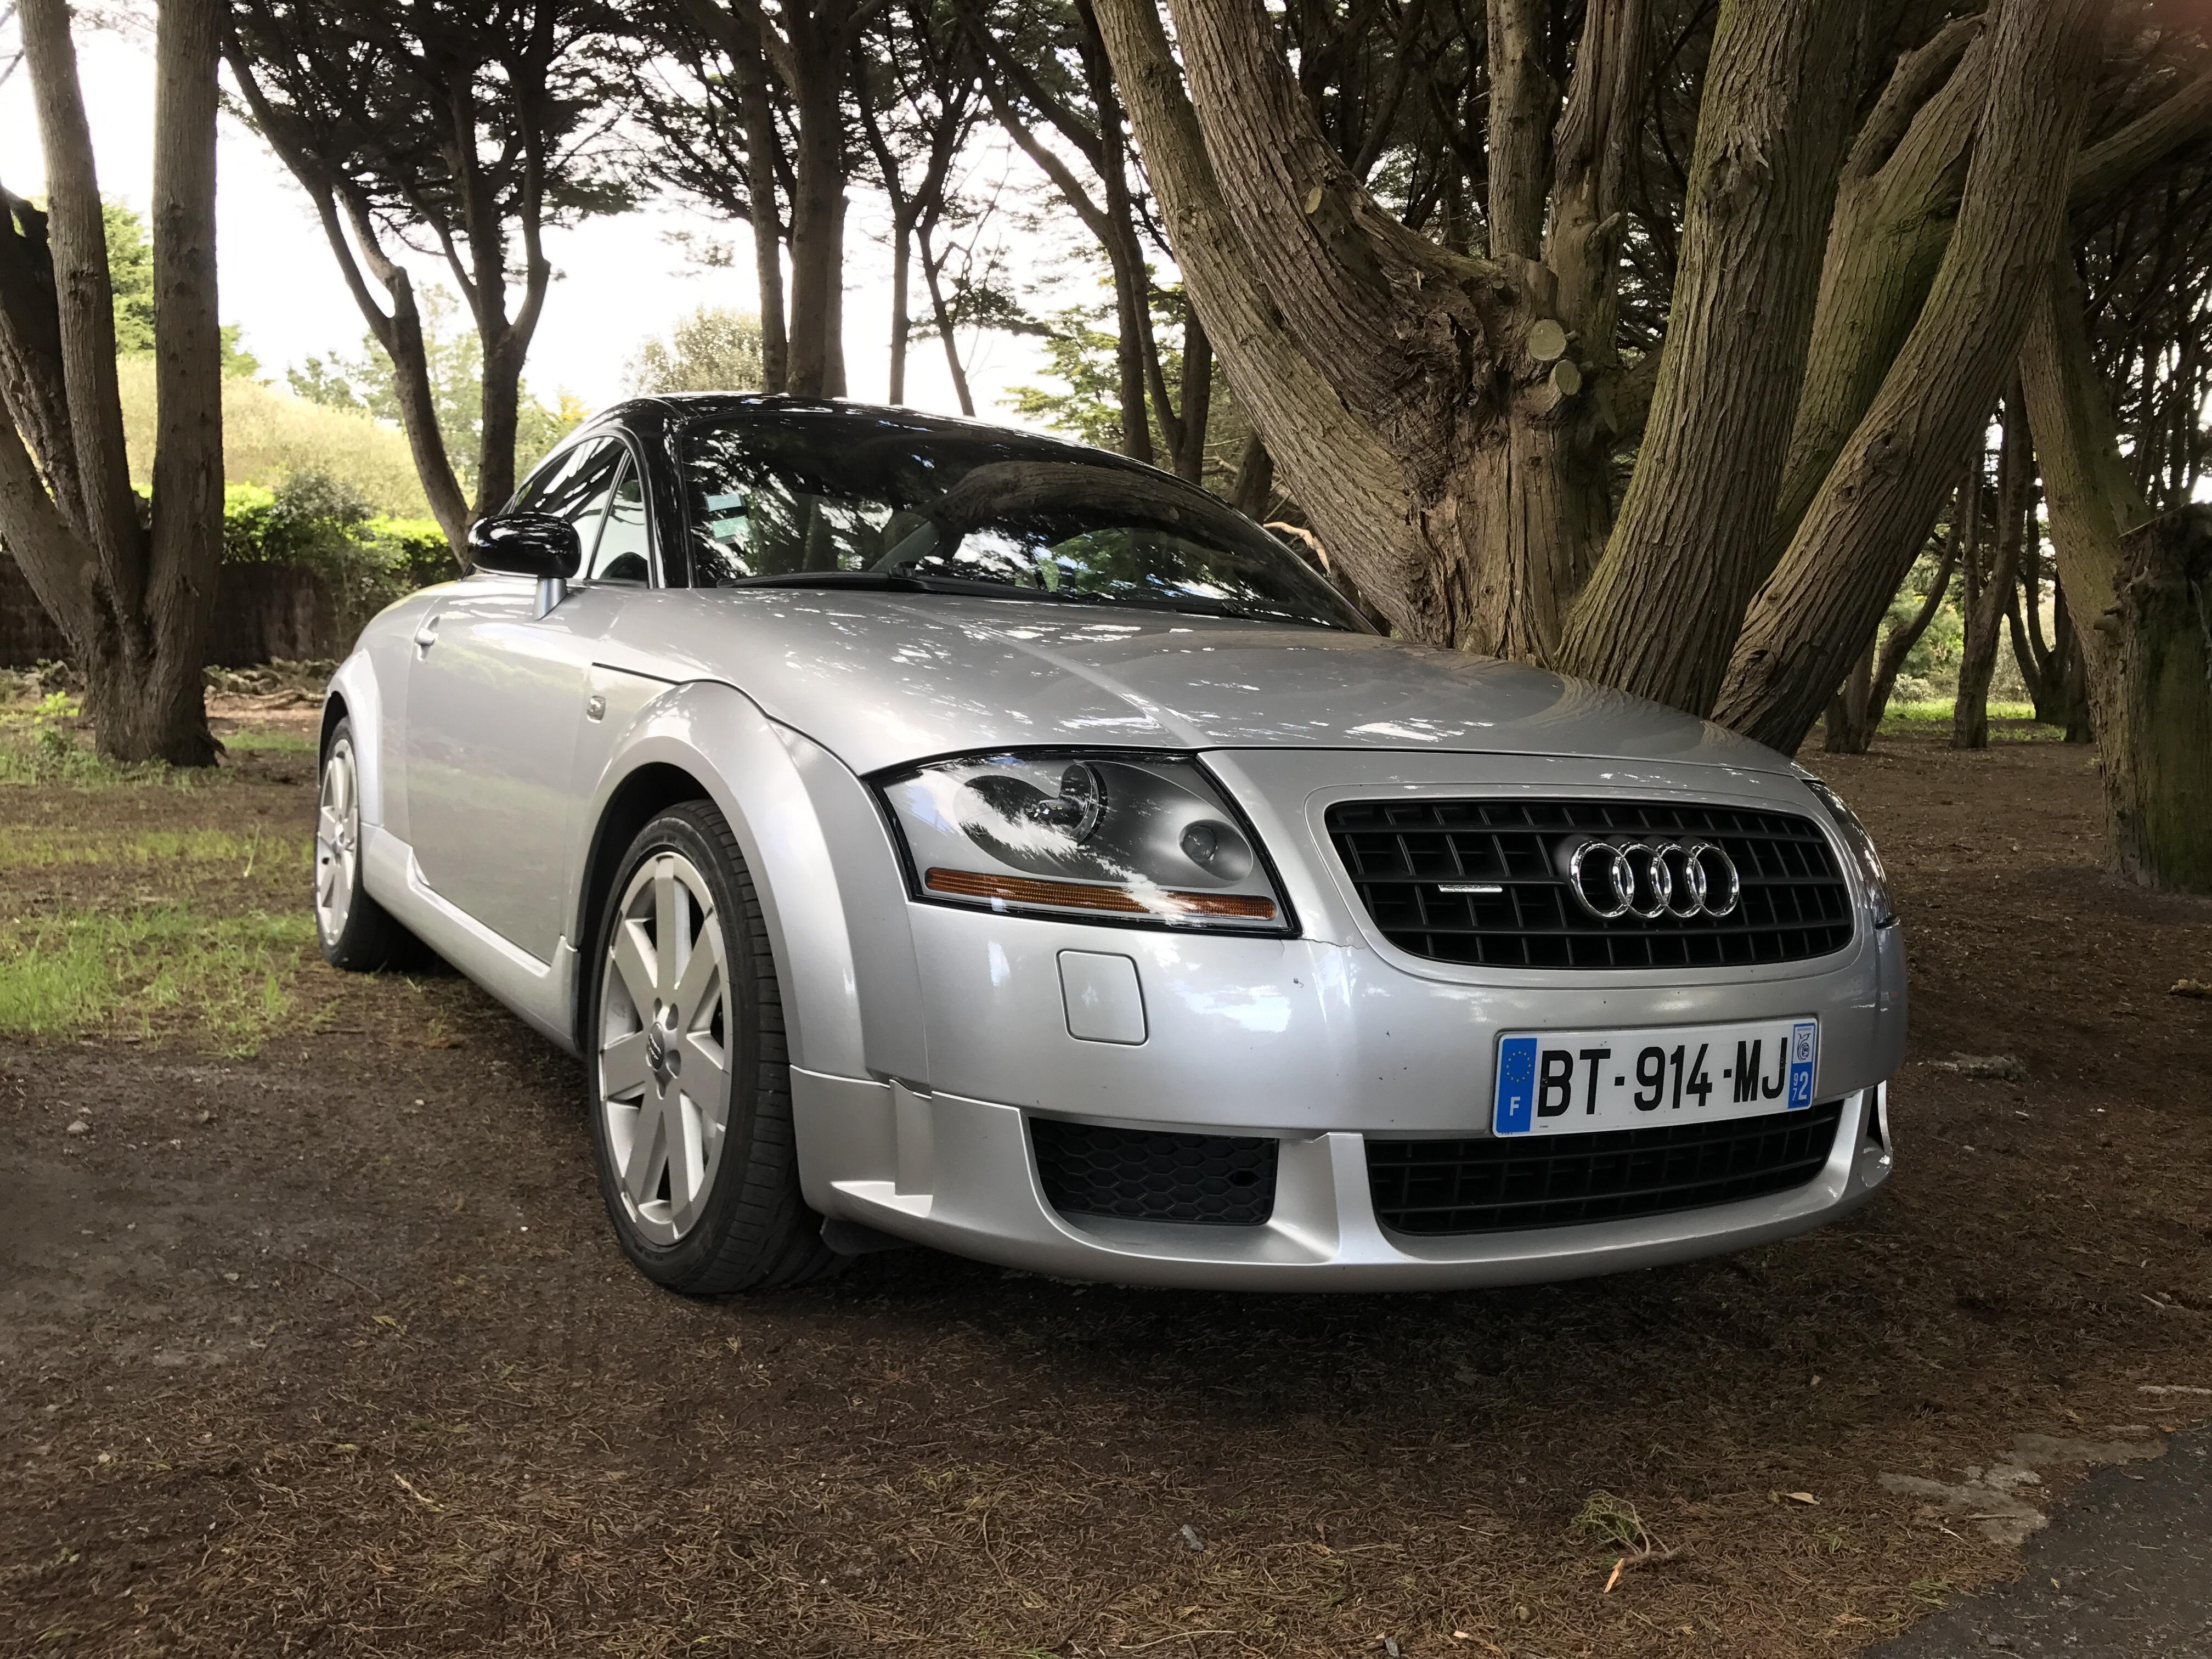 Kekurangan Audi Tt 3.2 V6 Spesifikasi